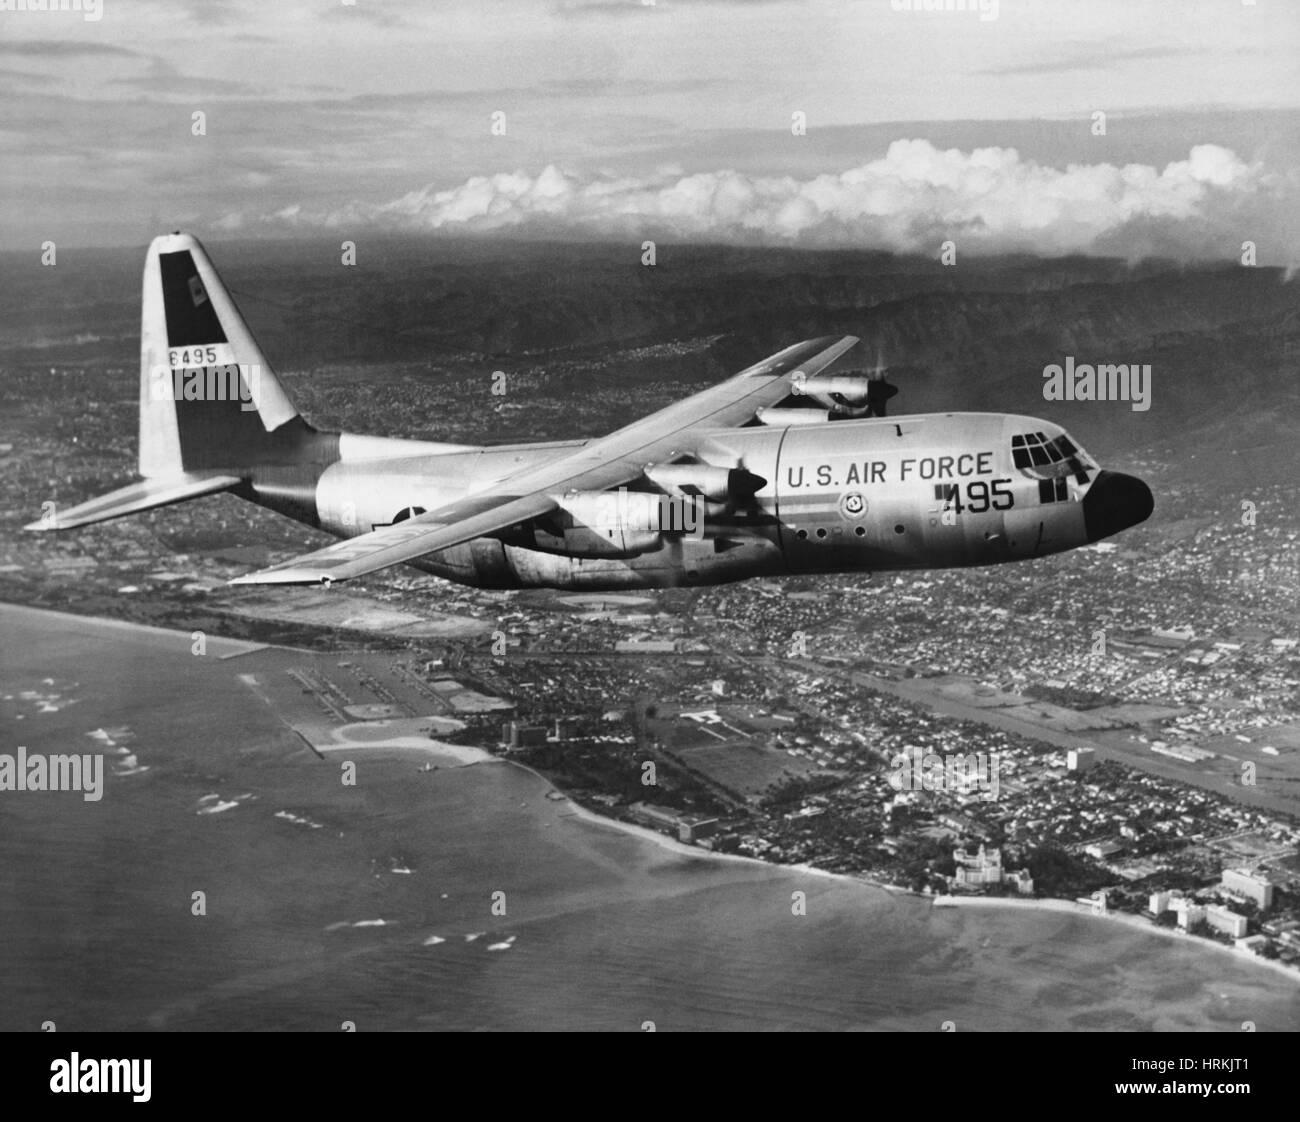 Lockheed C-130 Hercules, 1950s - Stock Image